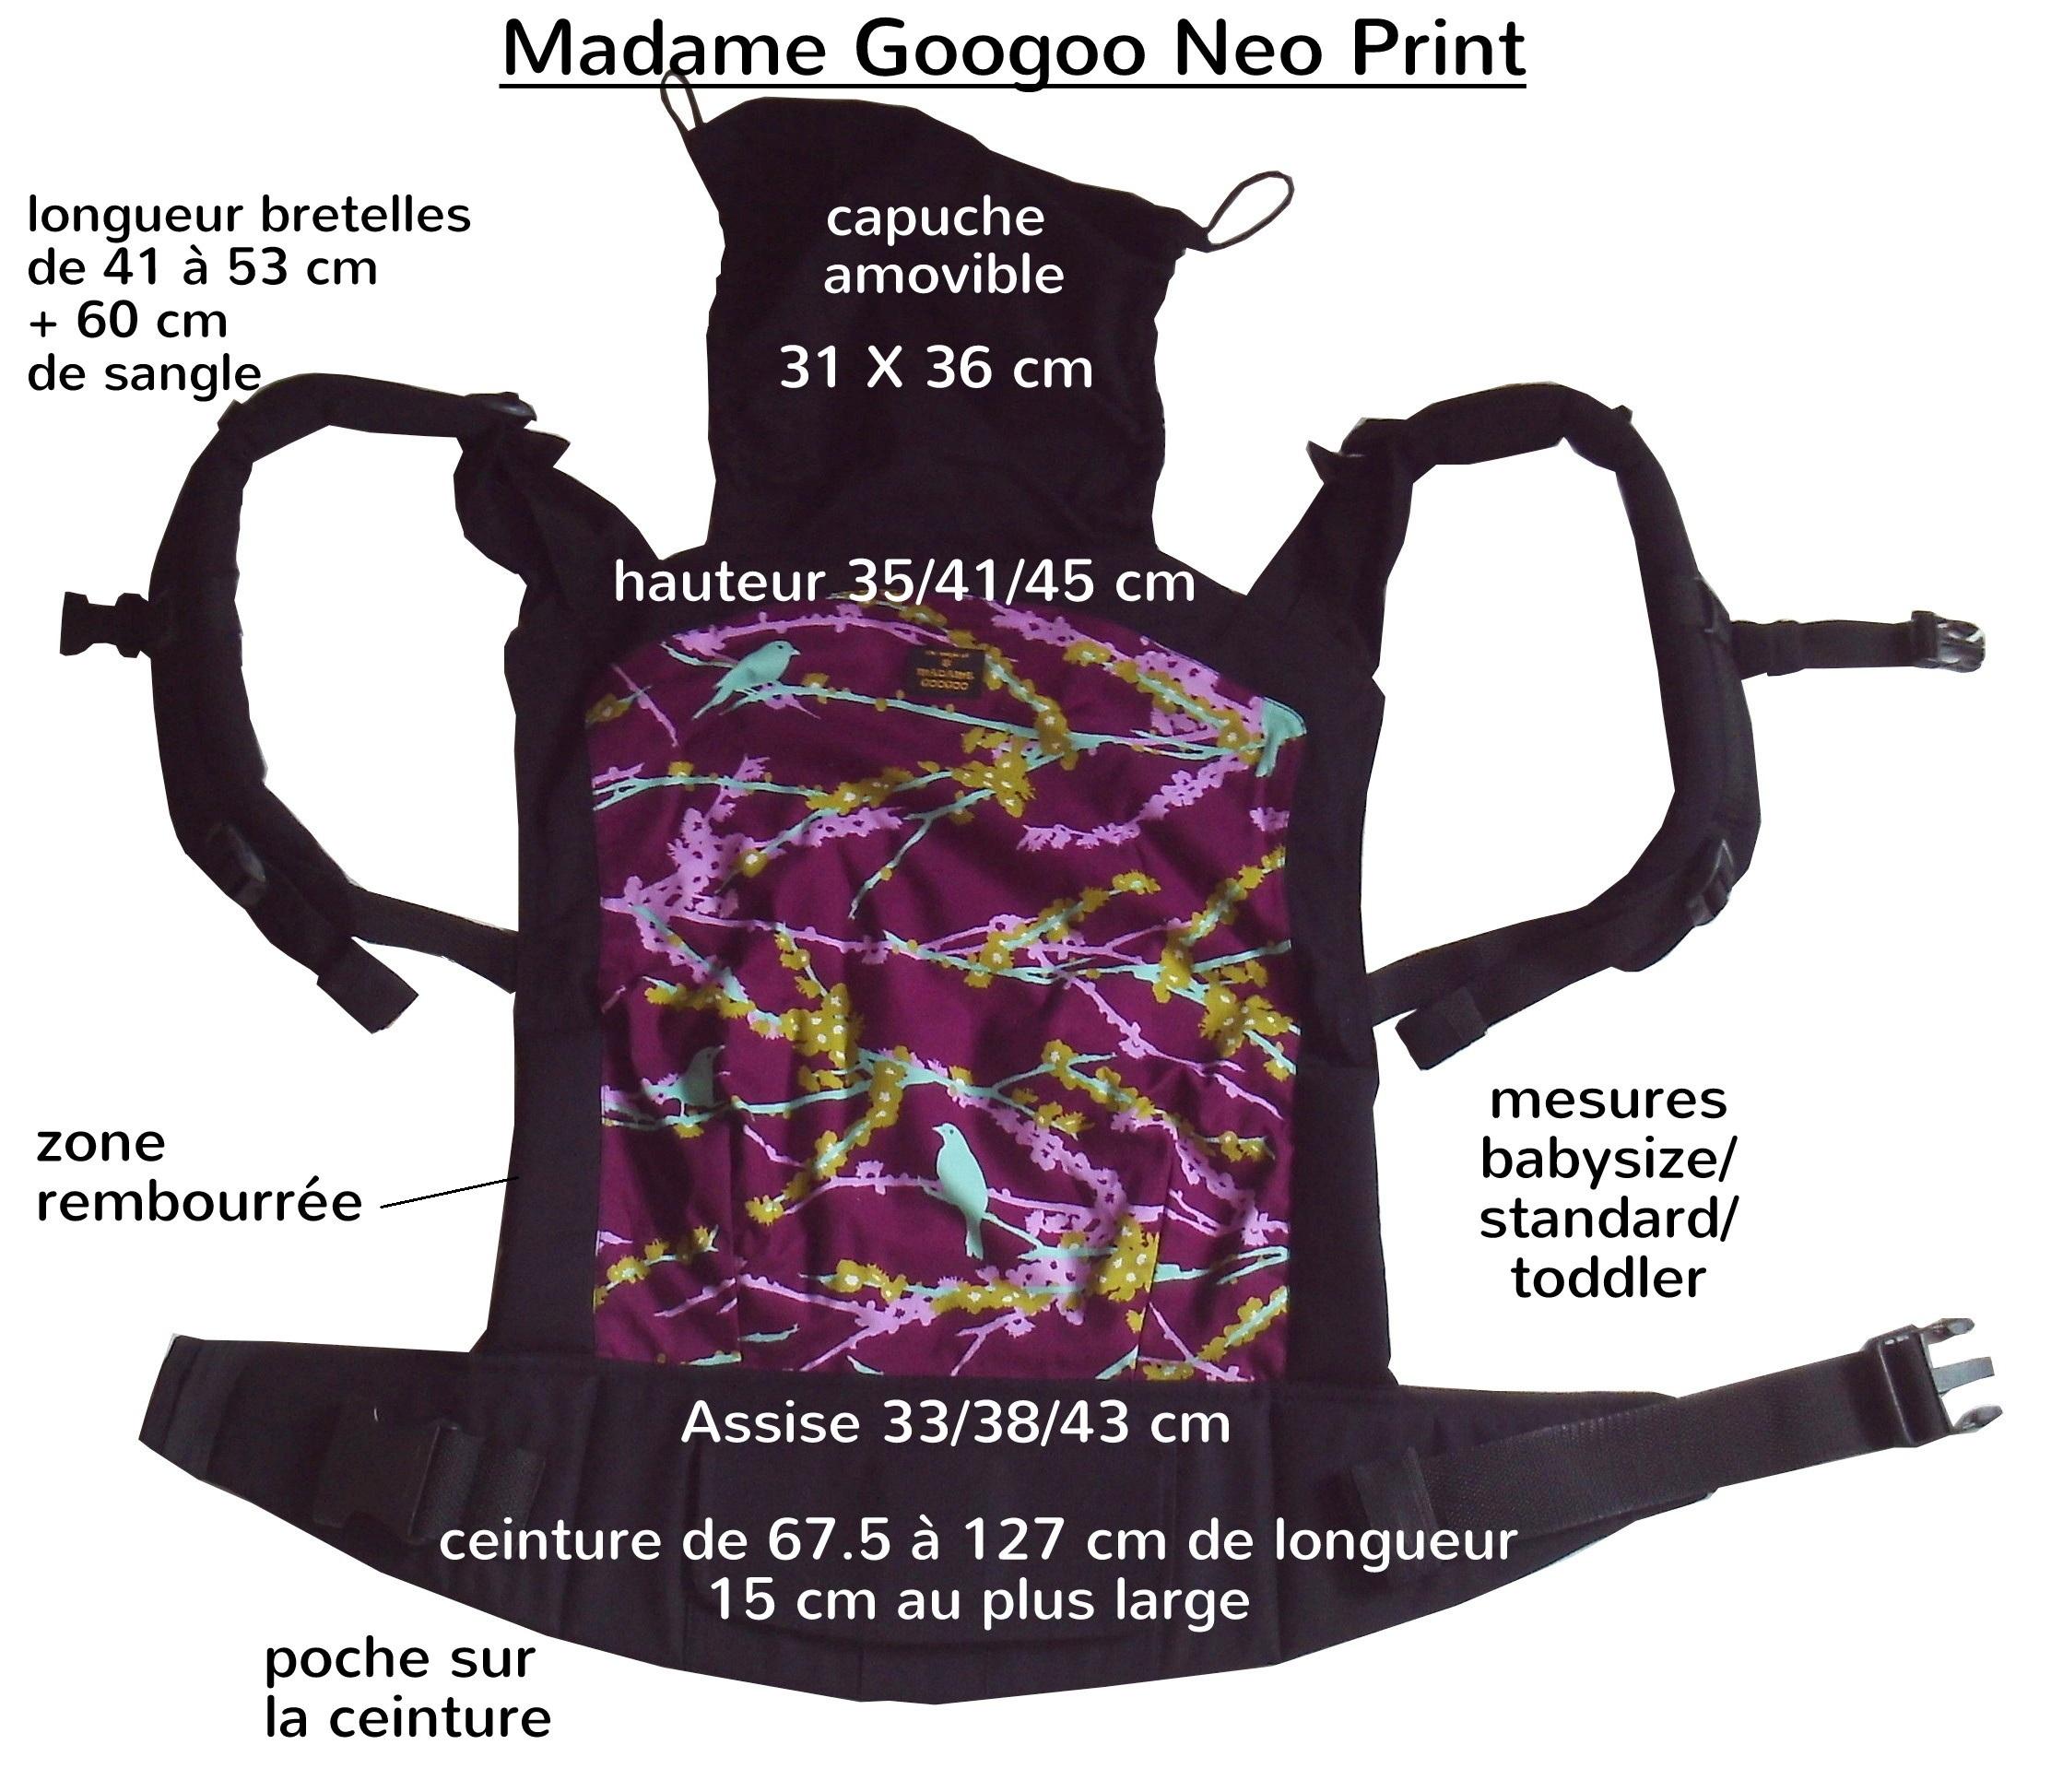 dimensions Madame GooGoo Neo Print